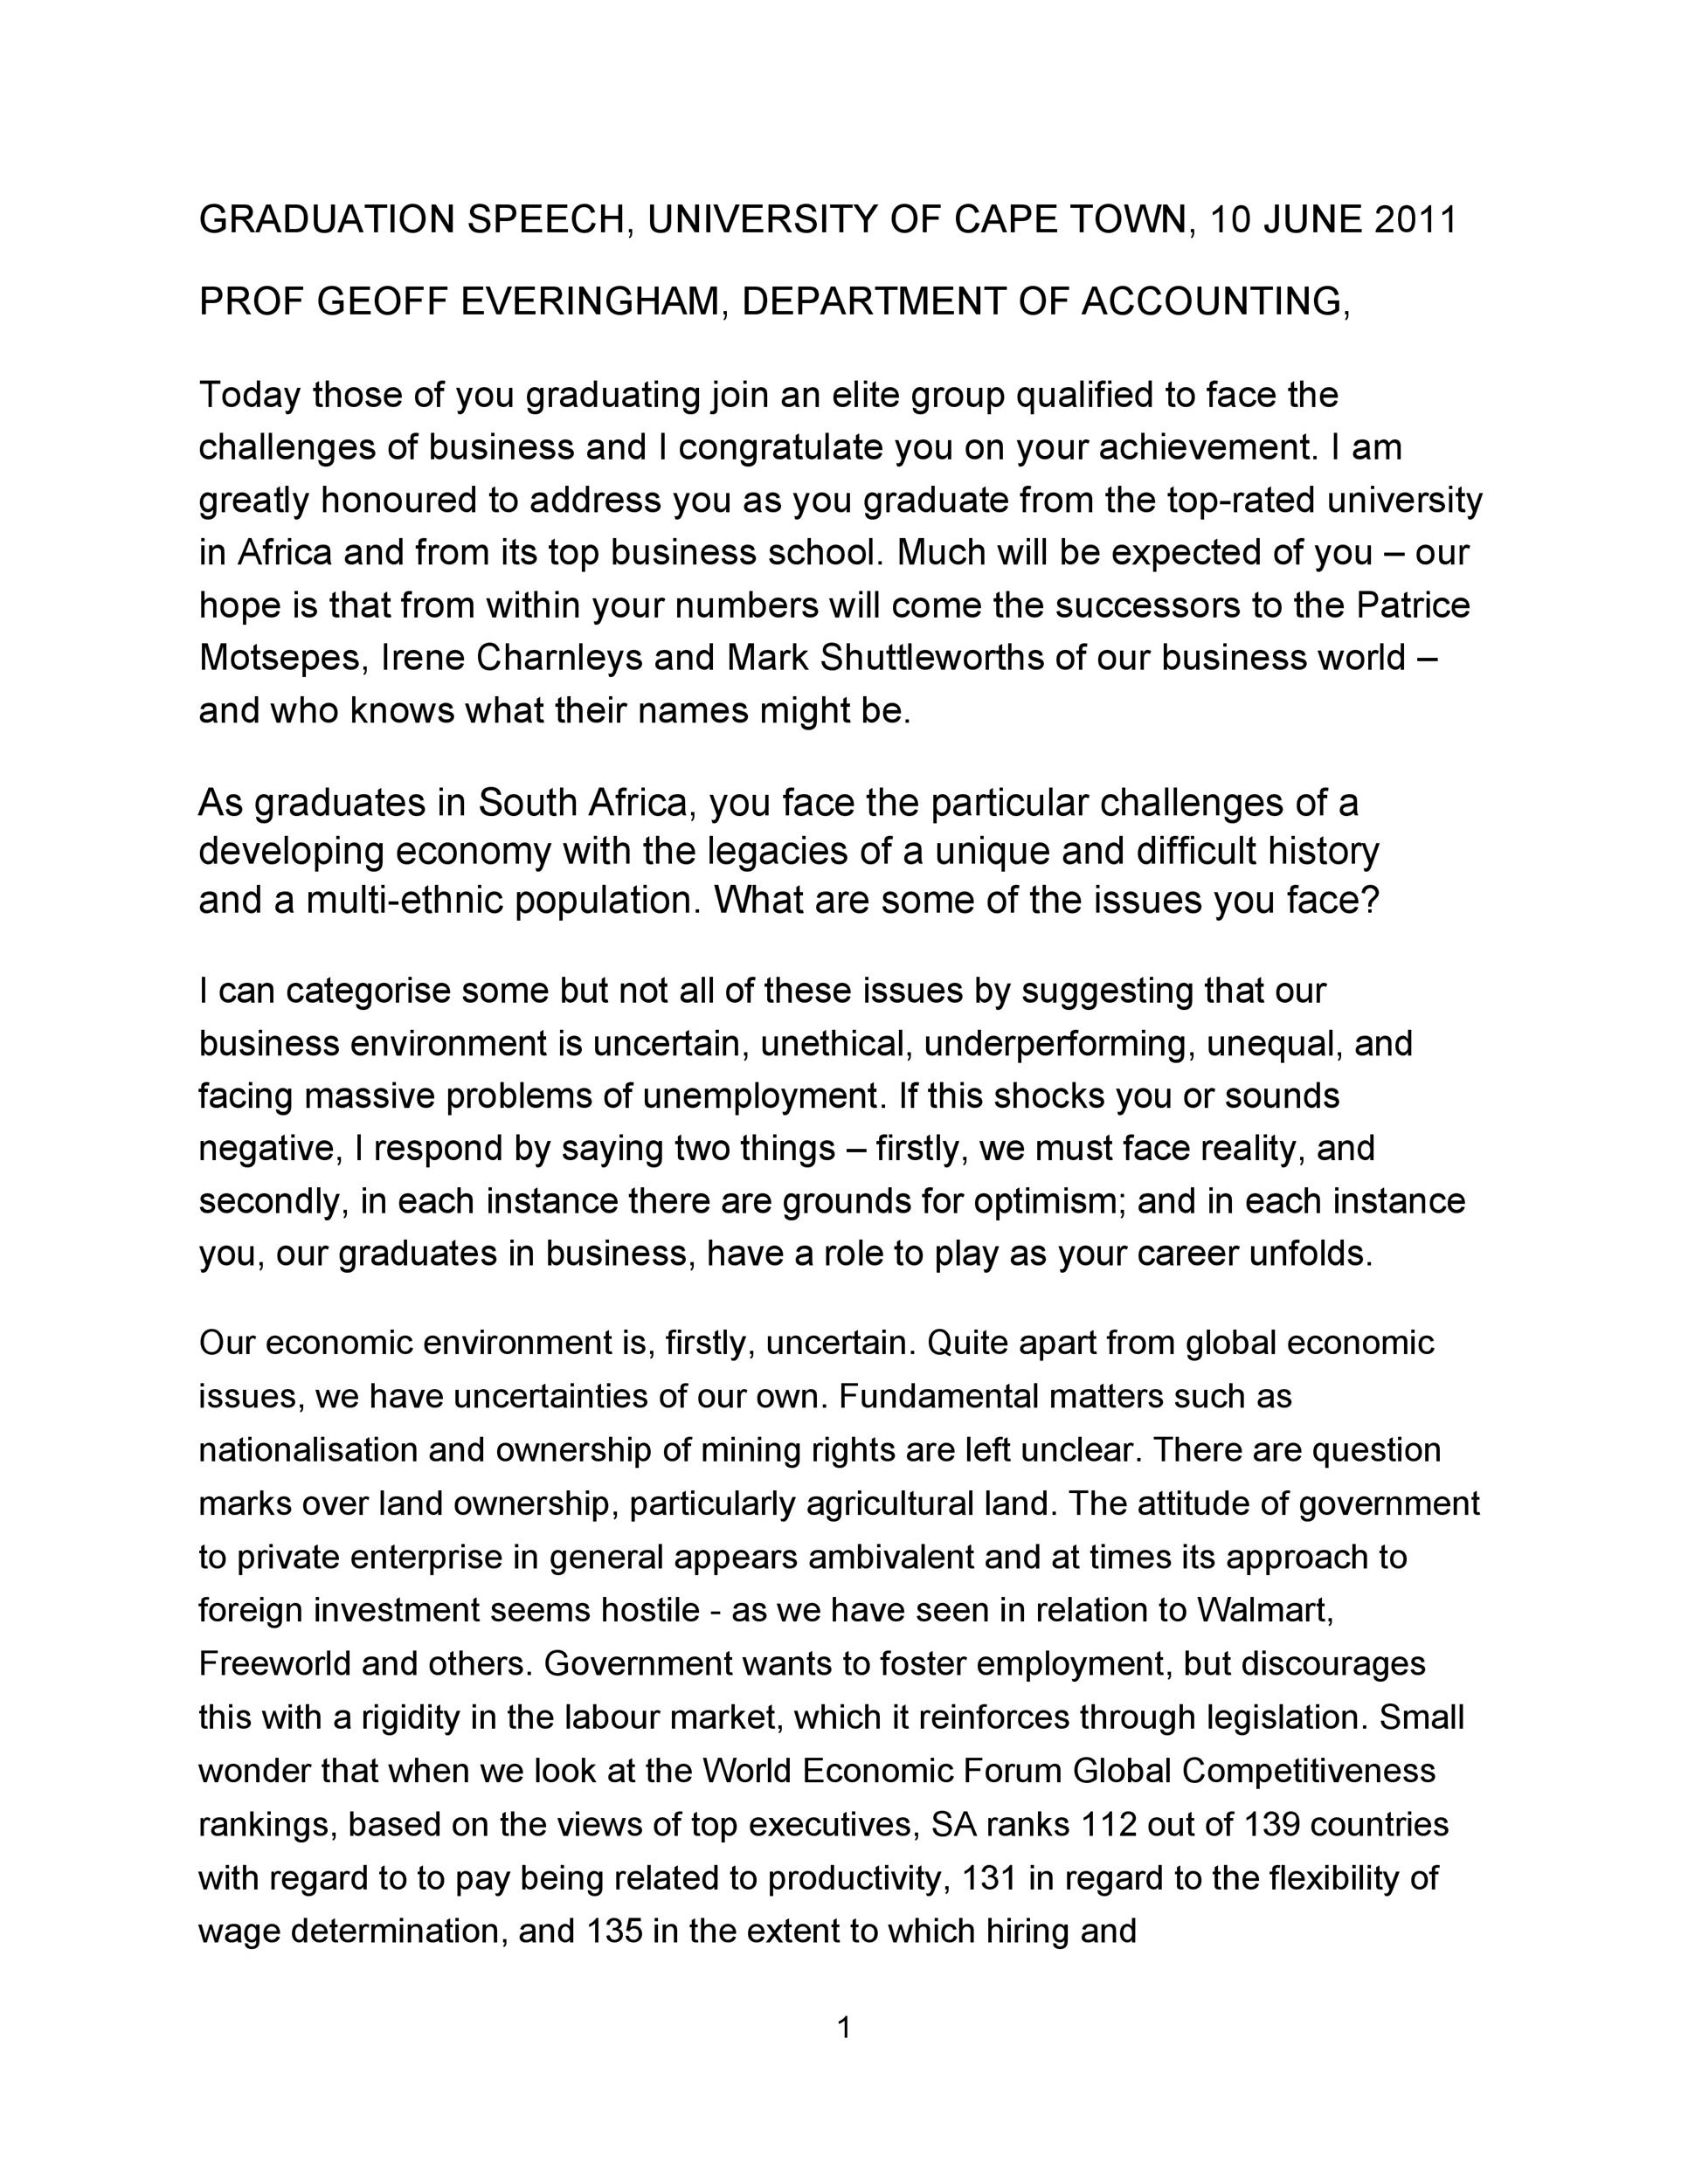 Free graduation speech example 24